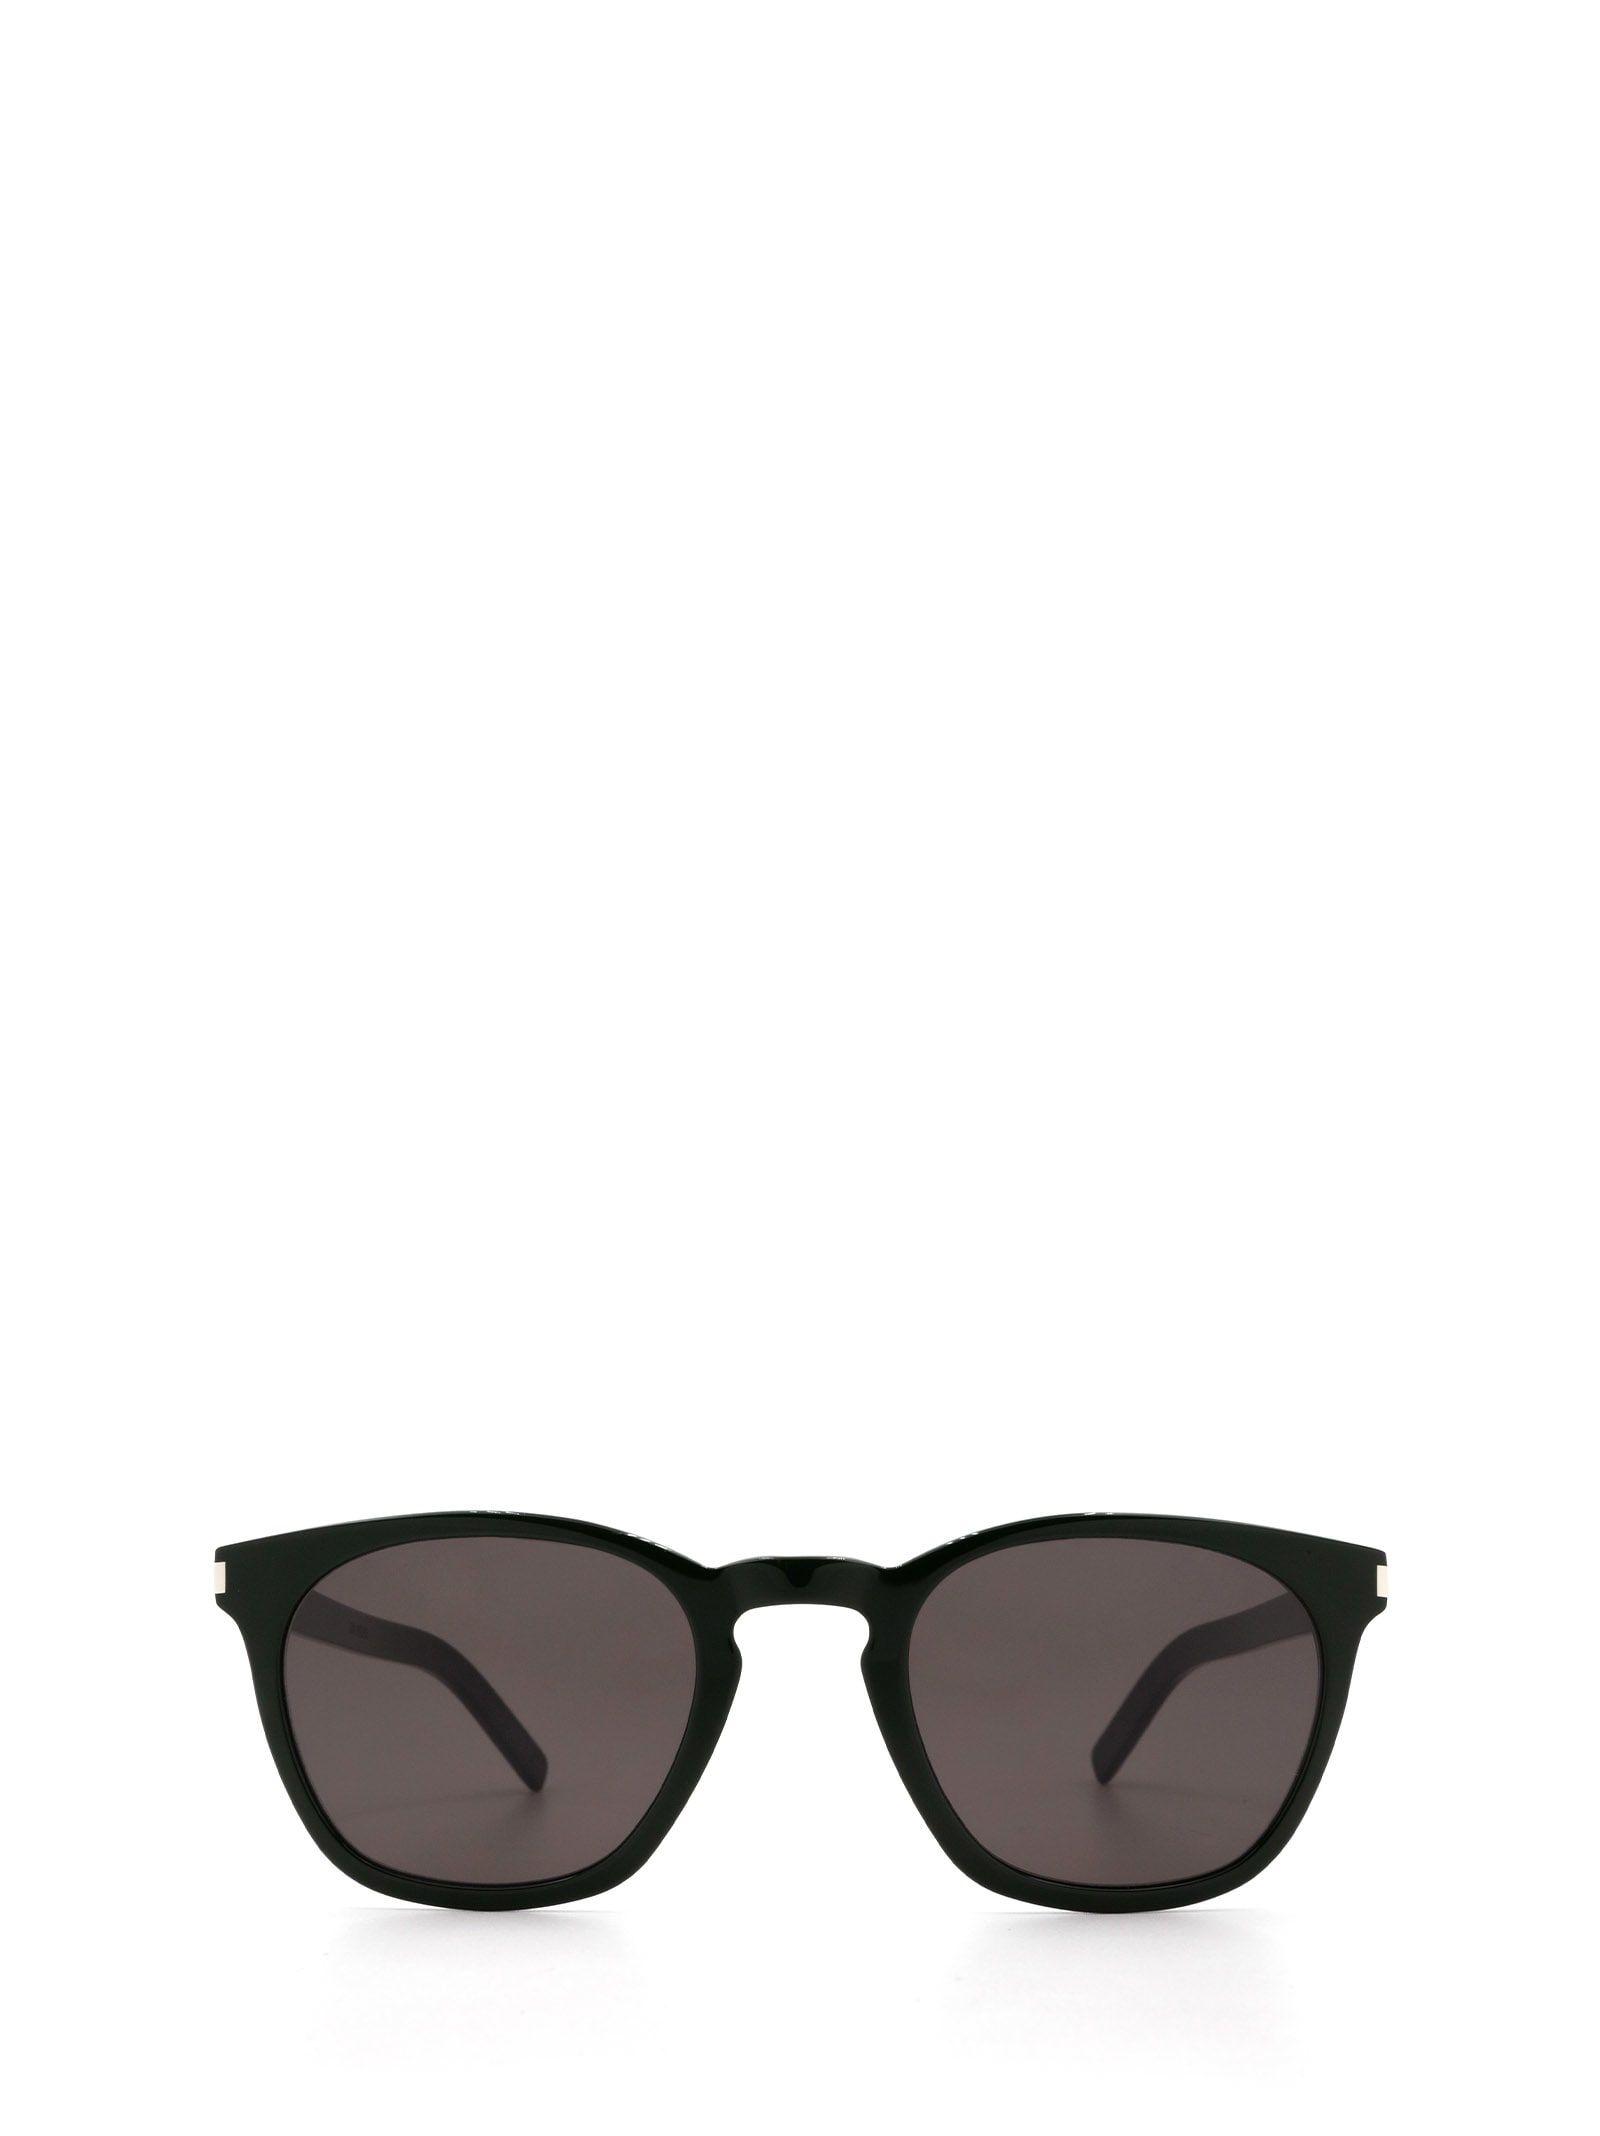 Saint Laurent Saint Laurent Sl28 Slim 005 Sunglasses